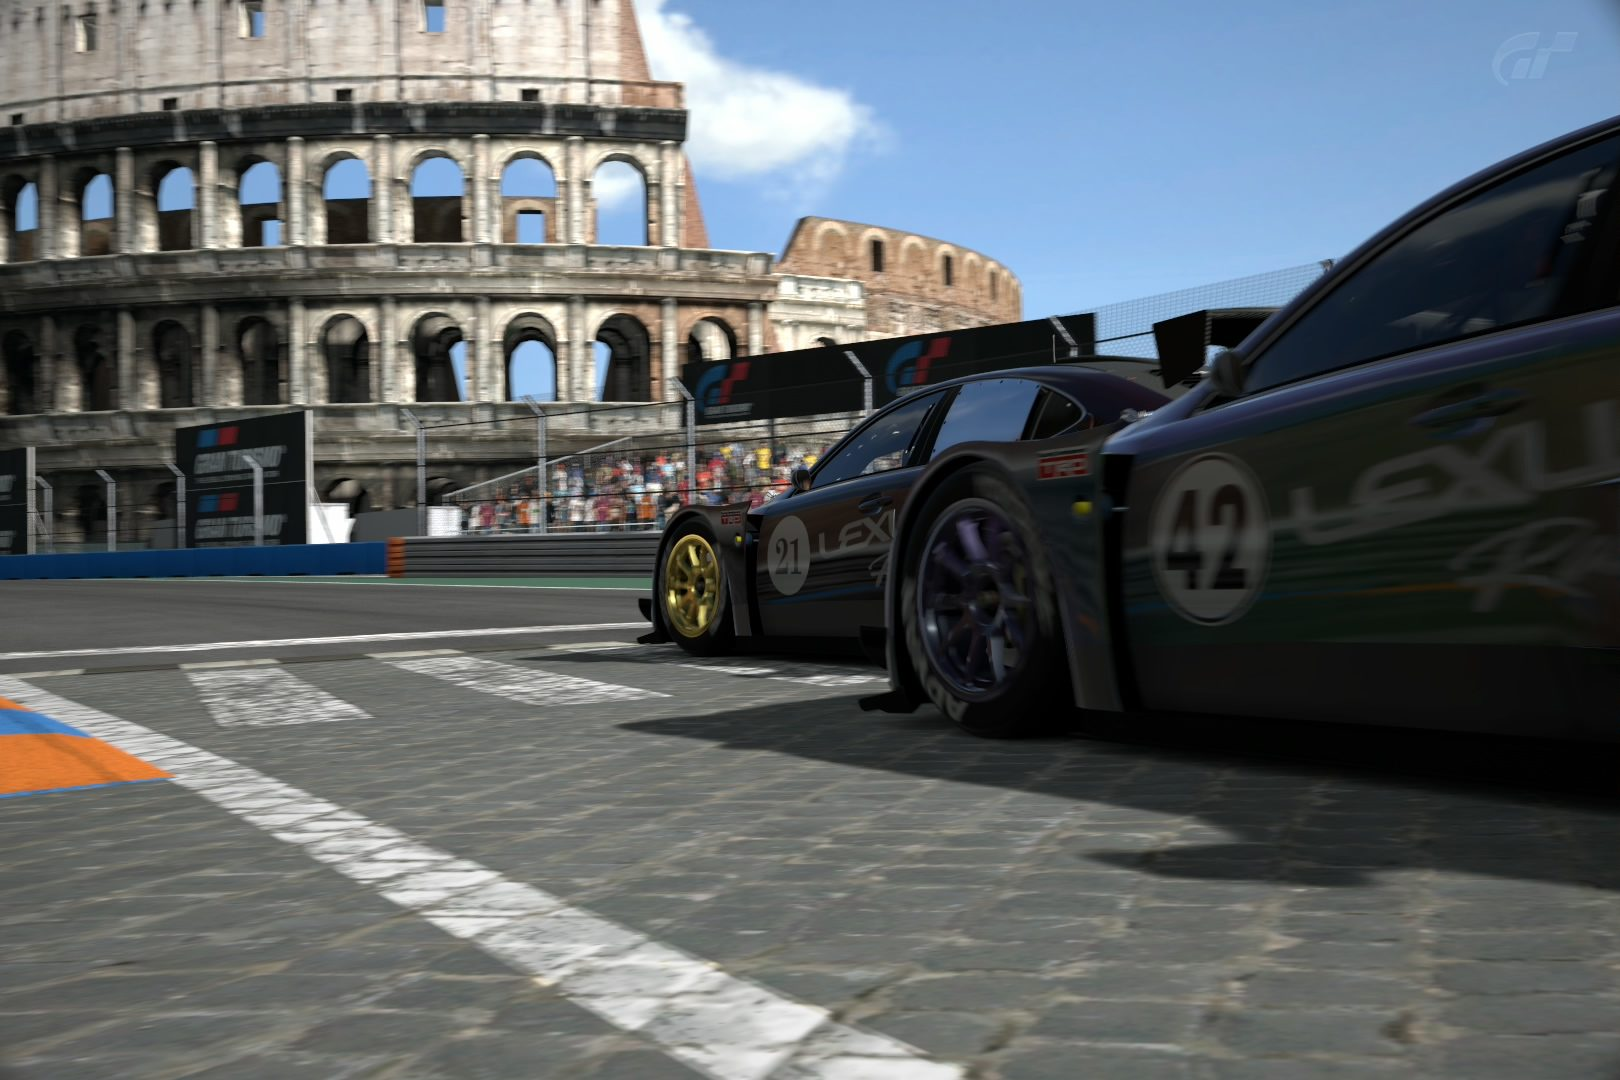 Circuito di Roma_52.jpg